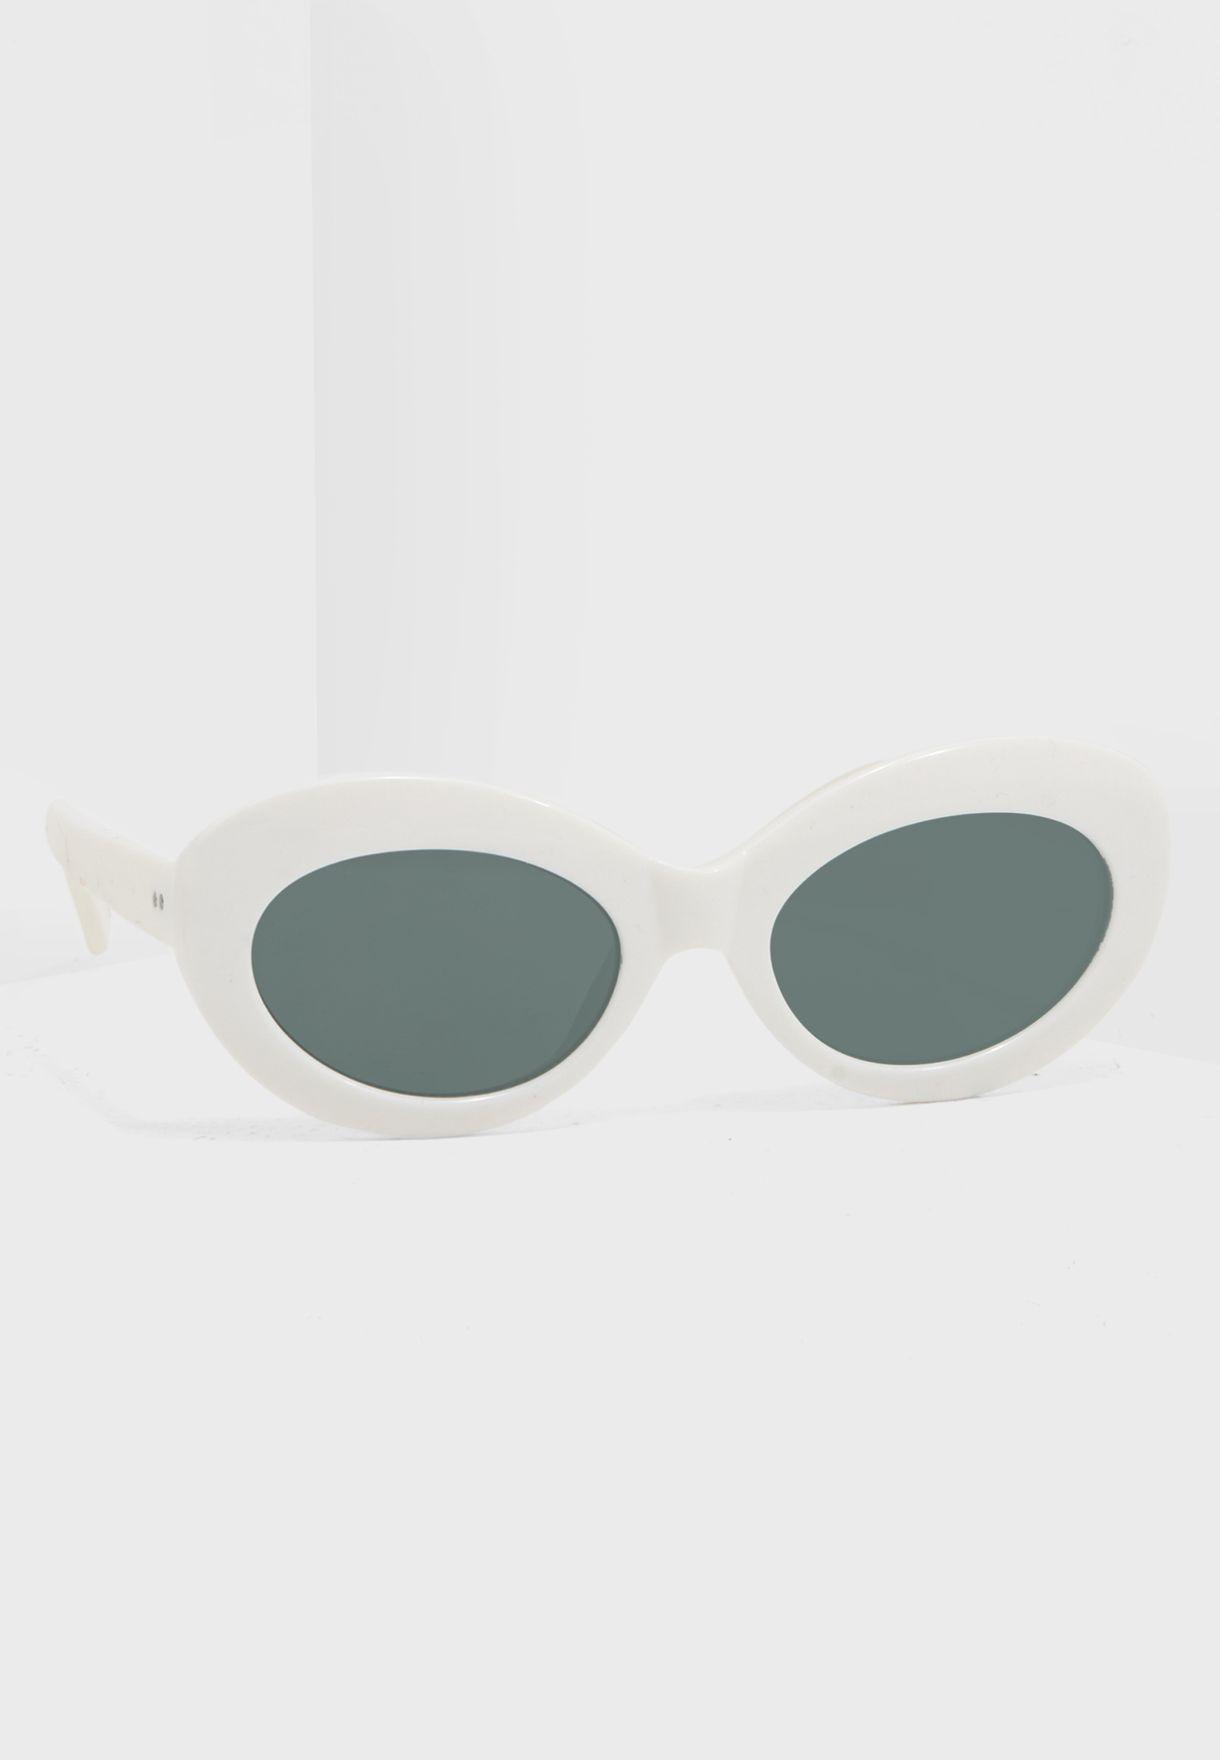 47494a3d7 تسوق نظارة شمسية بتصميم عصري ماركة مانجو لون أبيض 23037645 في عمان ...